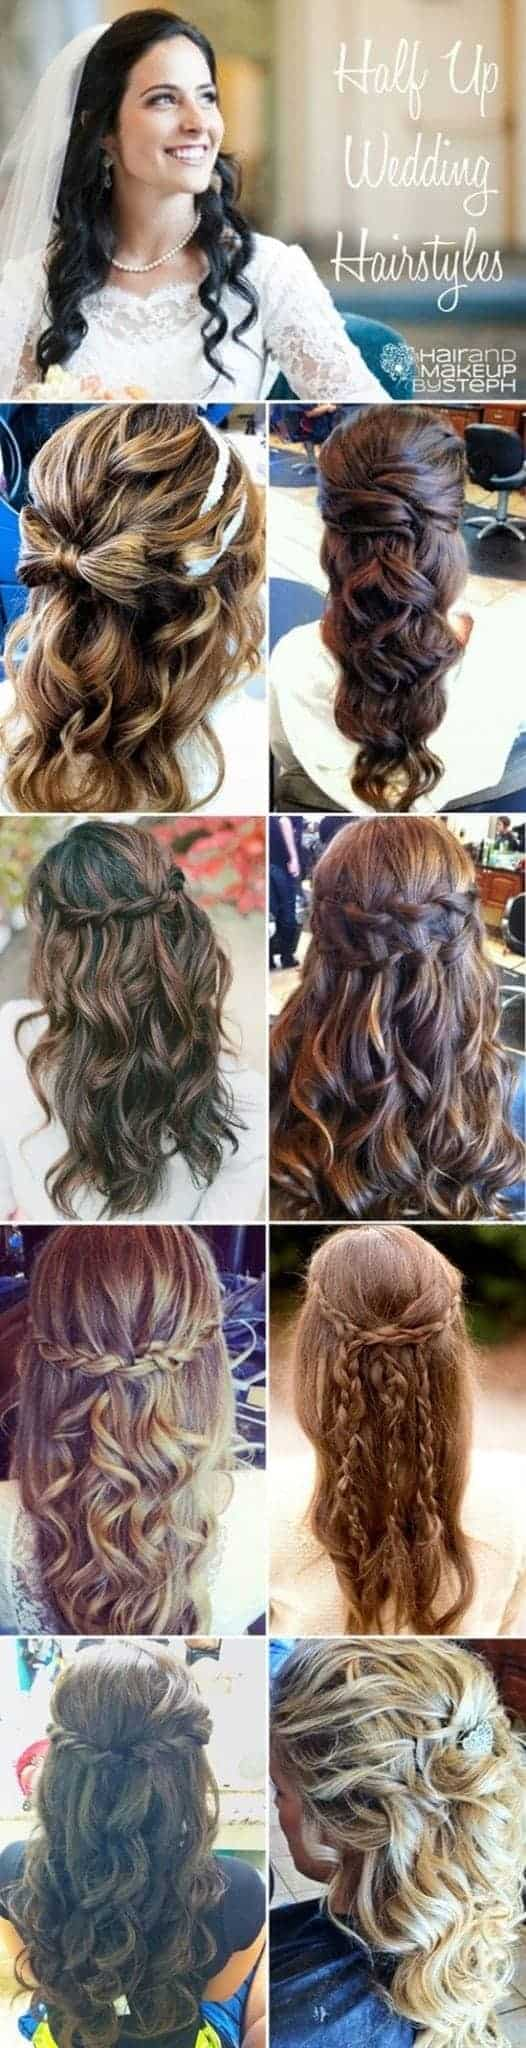 Halp Up Half down Wedding Hairstyles for Different Hair